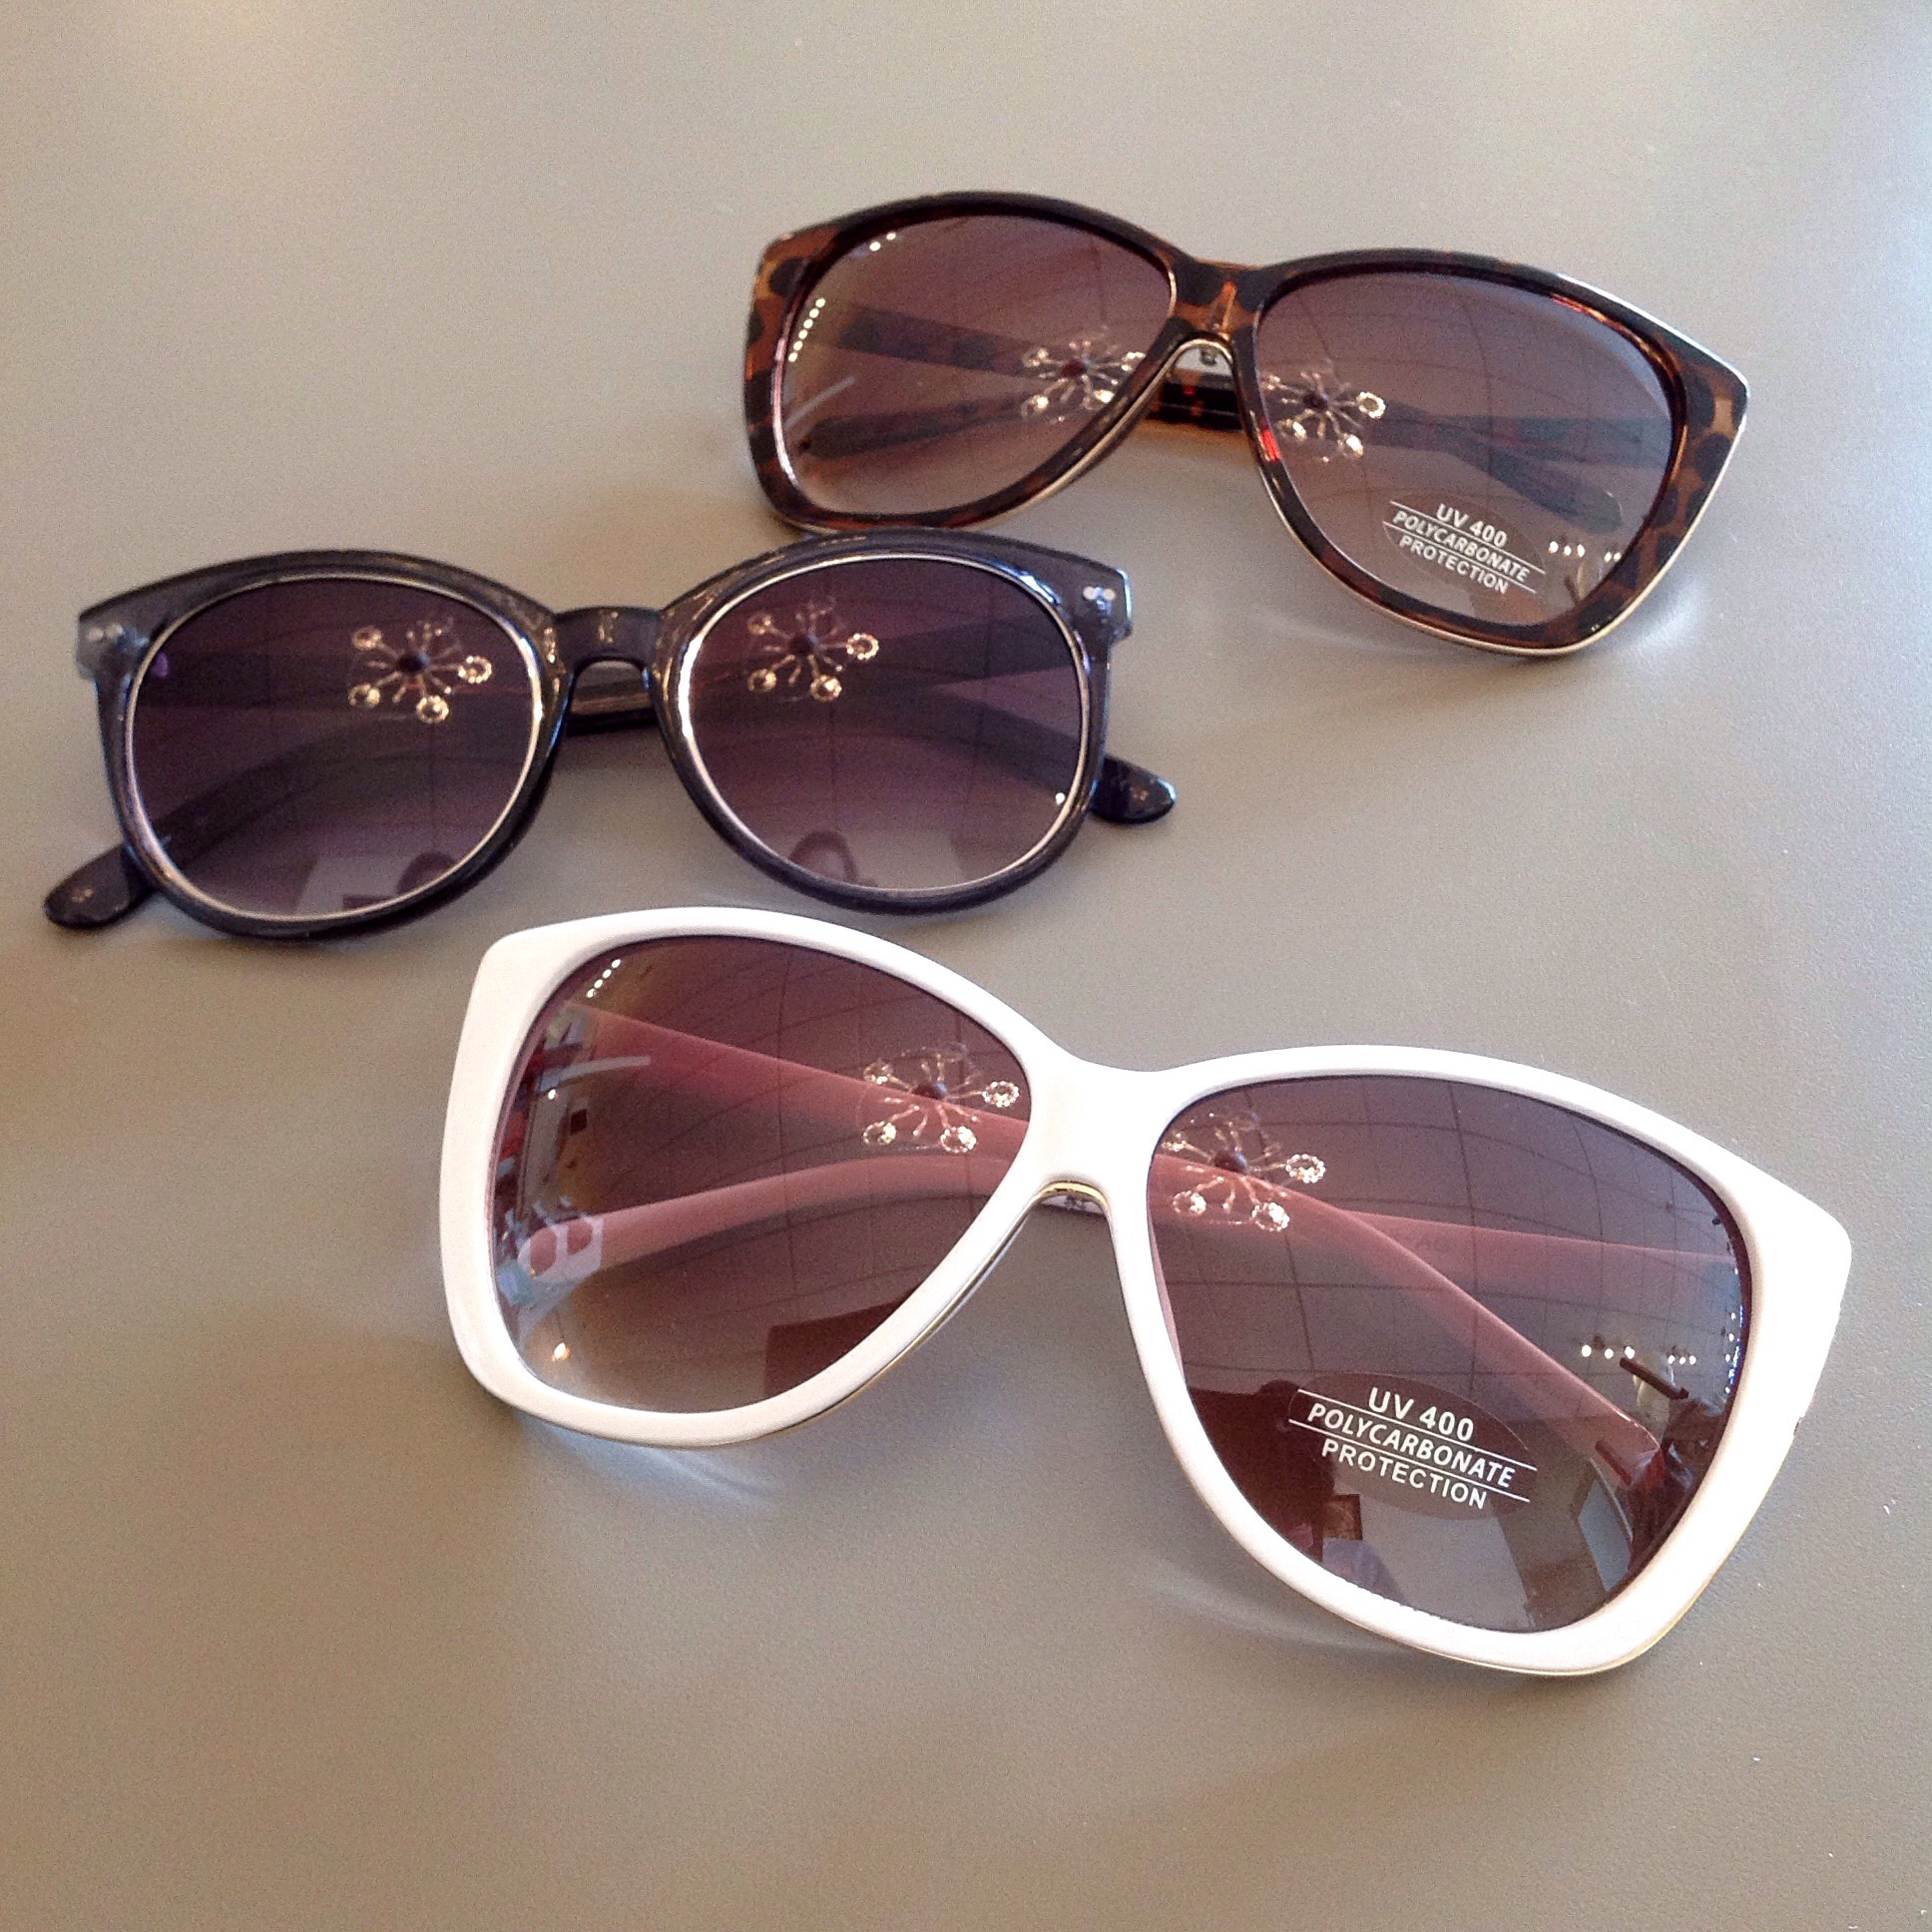 All shades $12